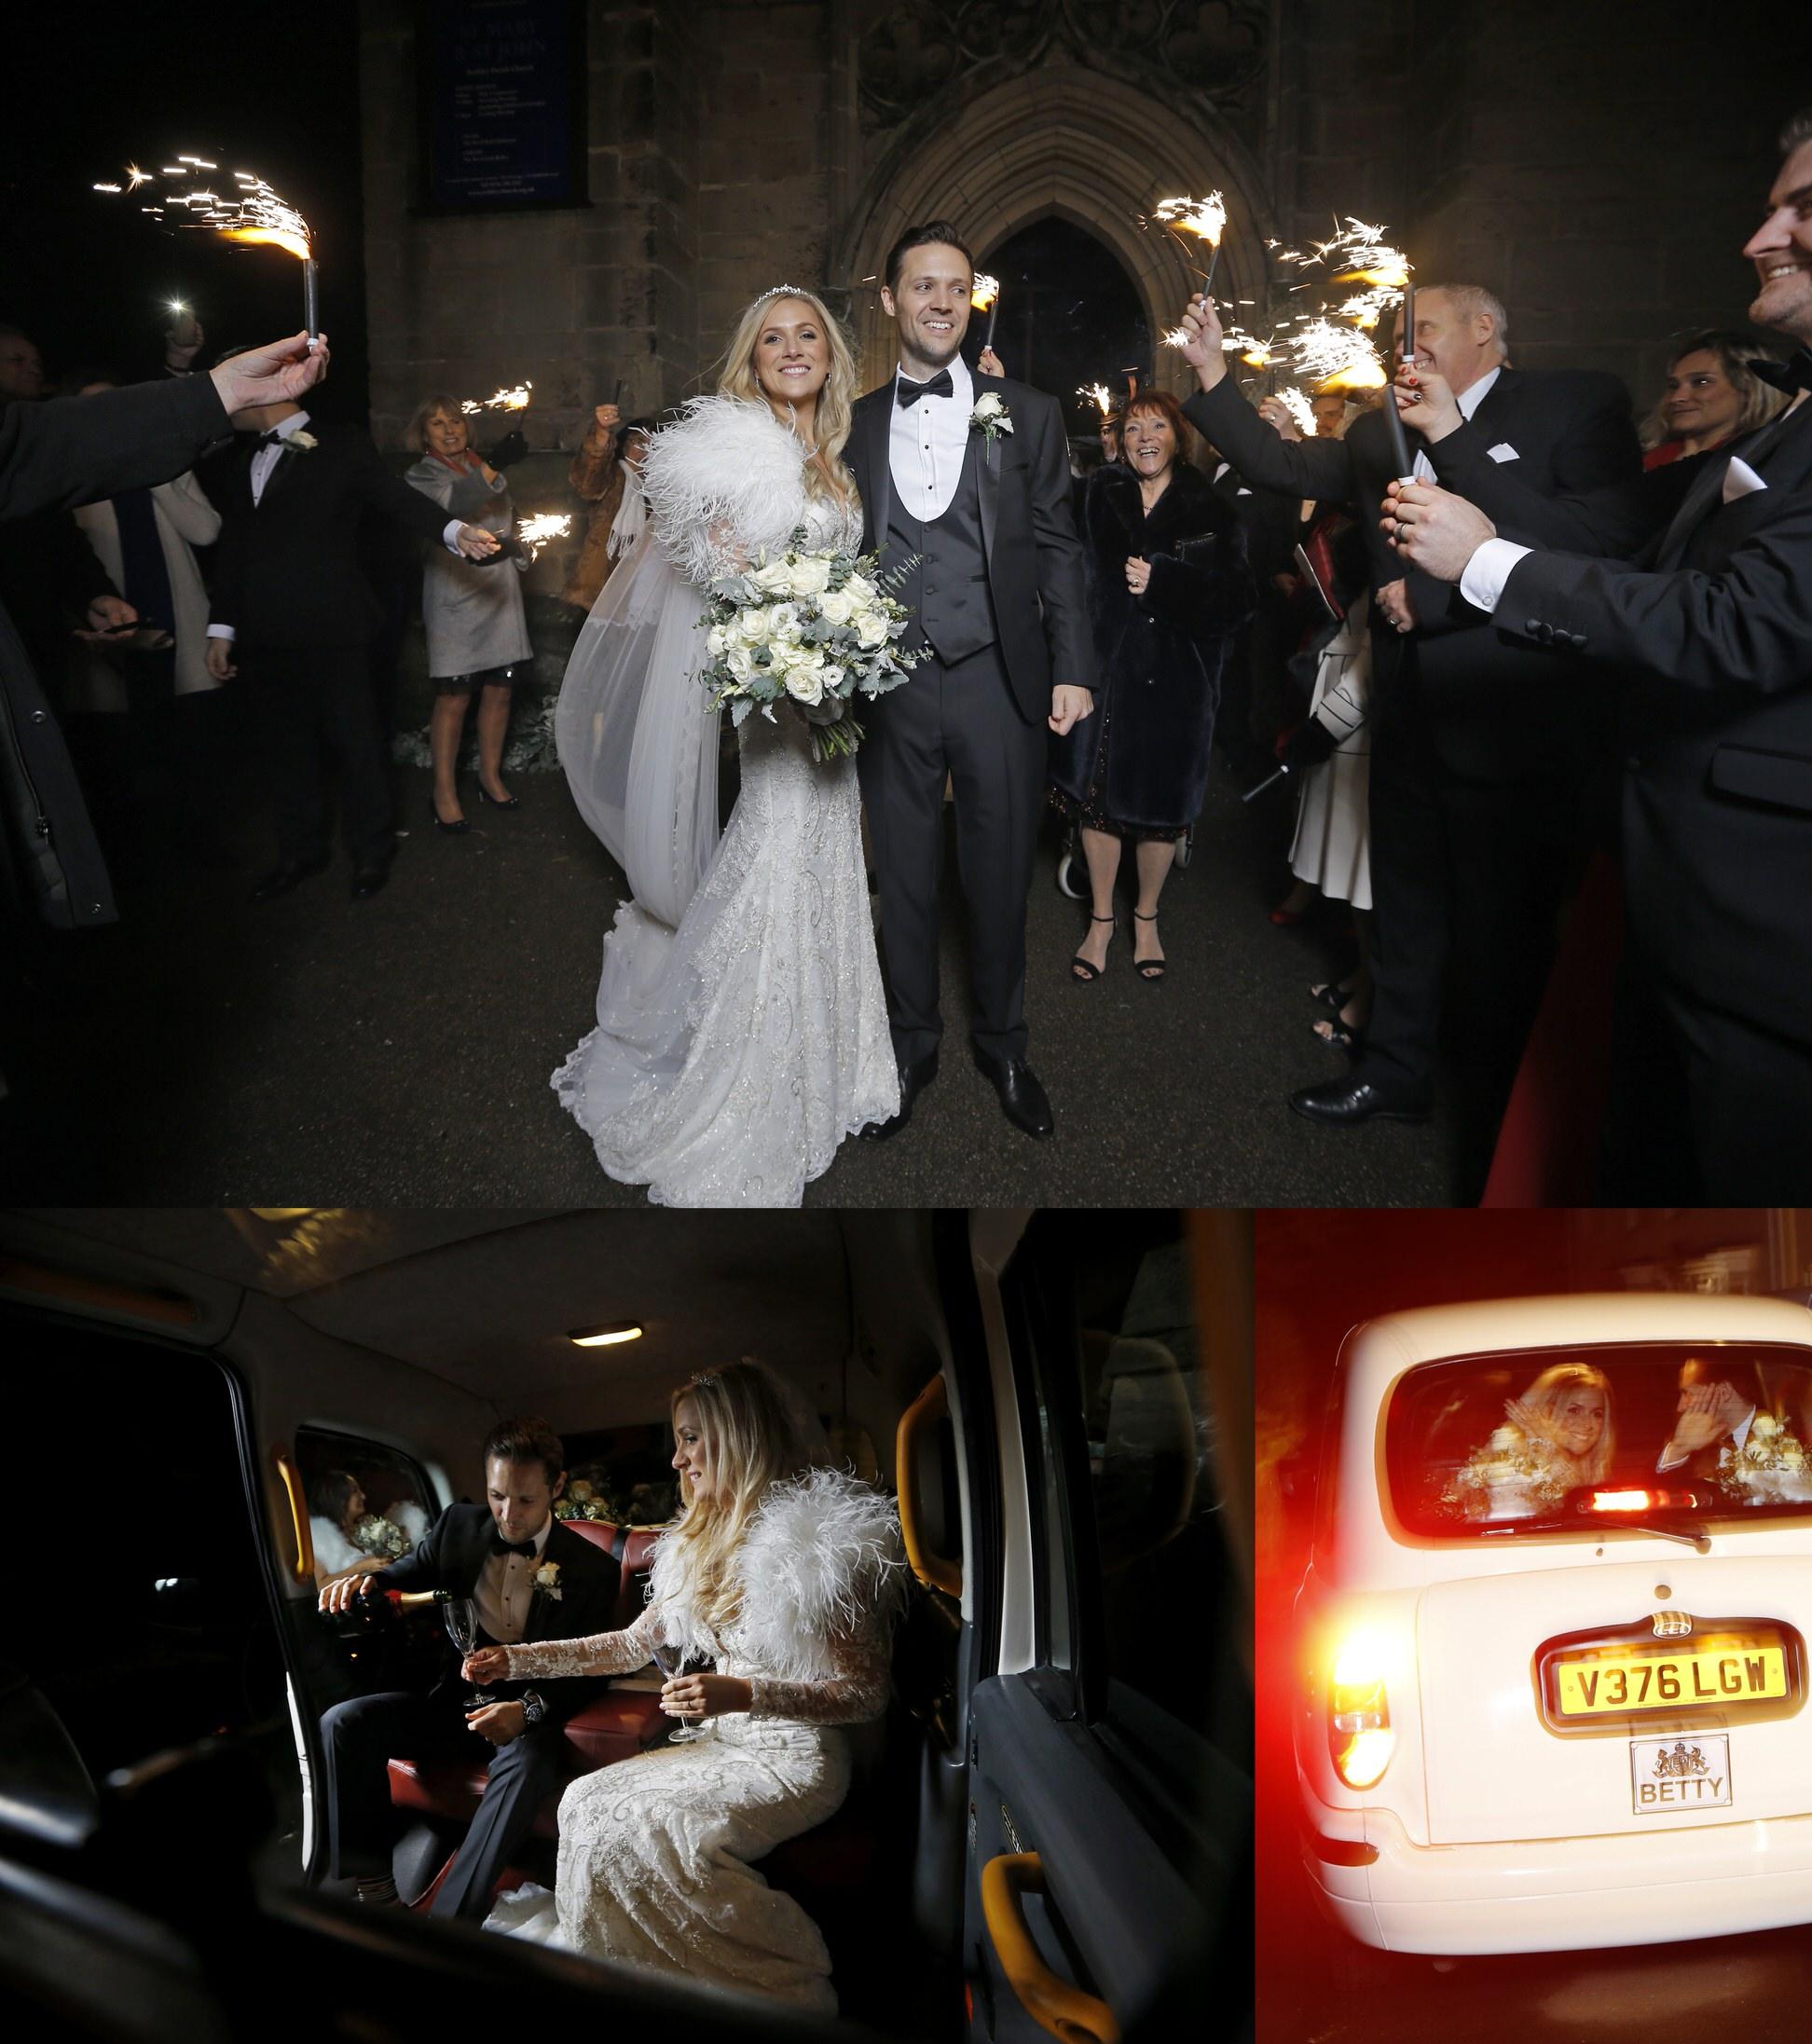 brett-harkness-winter-wedding-uk-wedding-photographer_0016.jpg